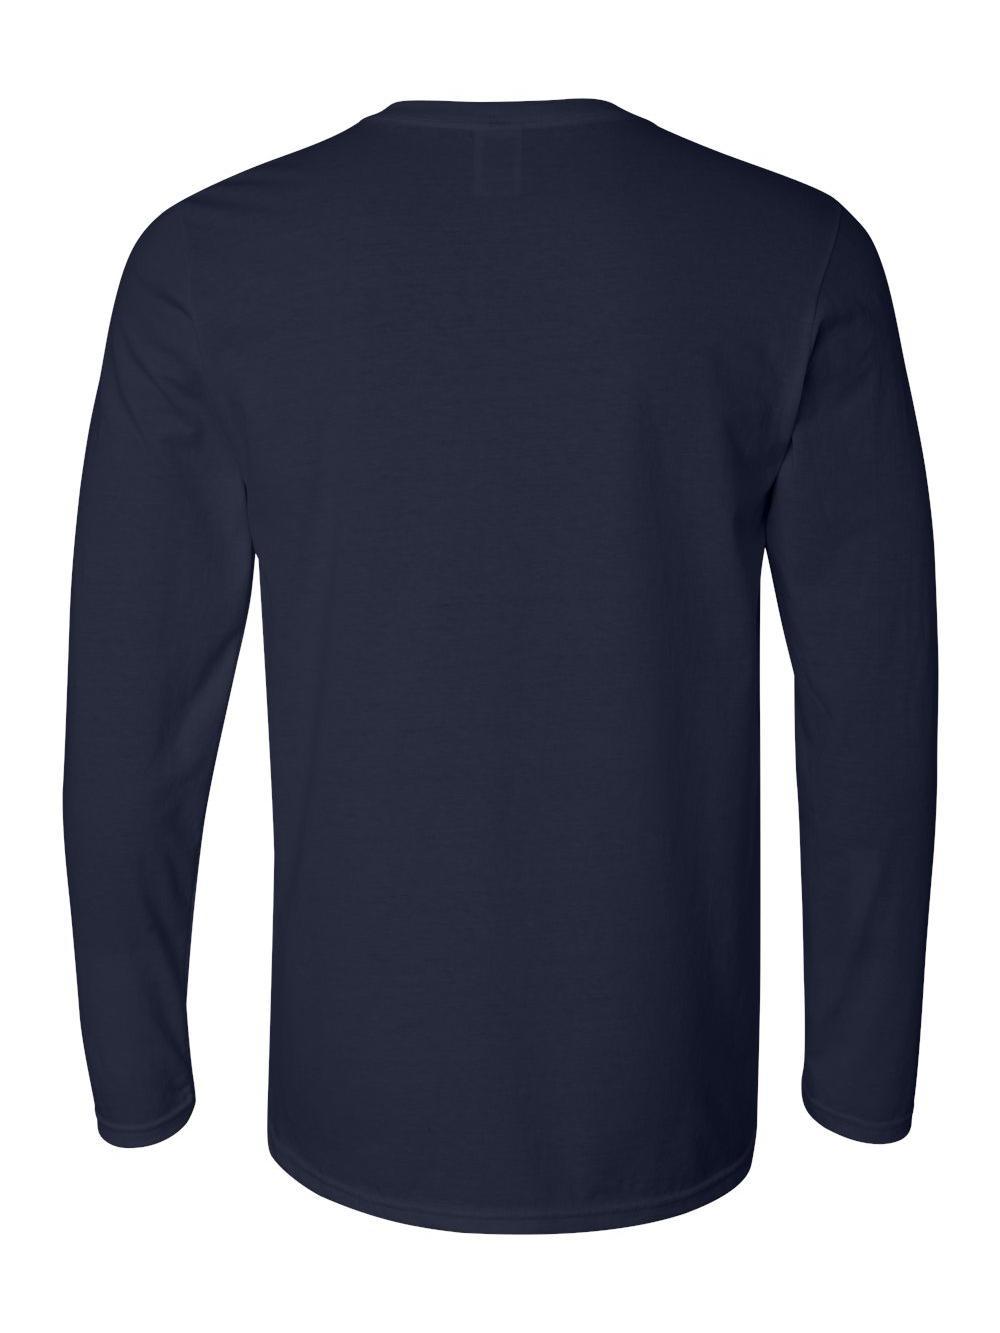 Gildan-Softstyle-Long-Sleeve-T-Shirt-64400 thumbnail 16